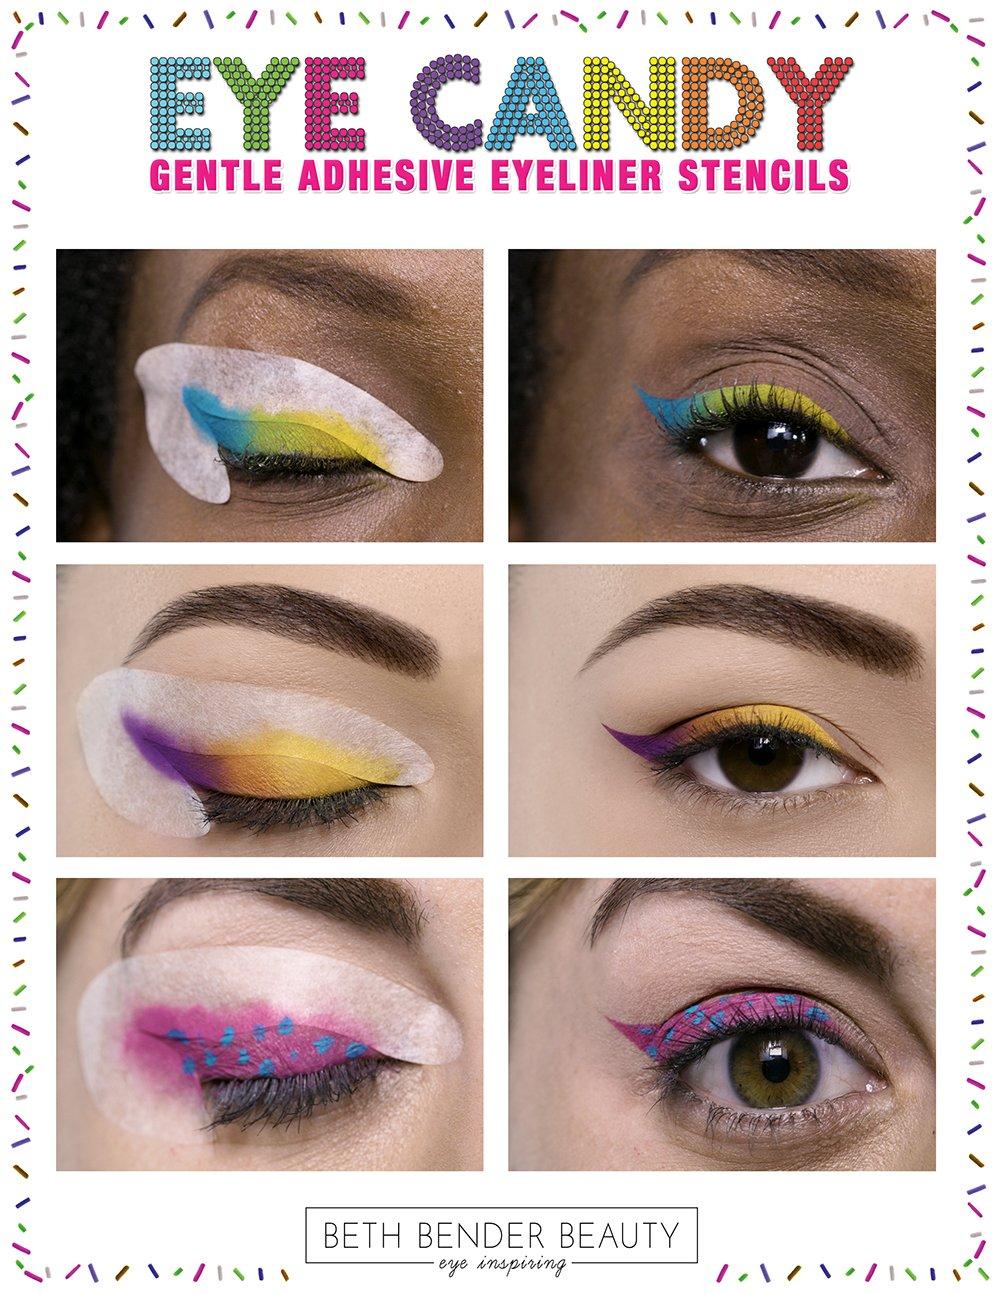 Savvy Deets Bridal: Bridal Beauty: Winged Eyeliner Stencil